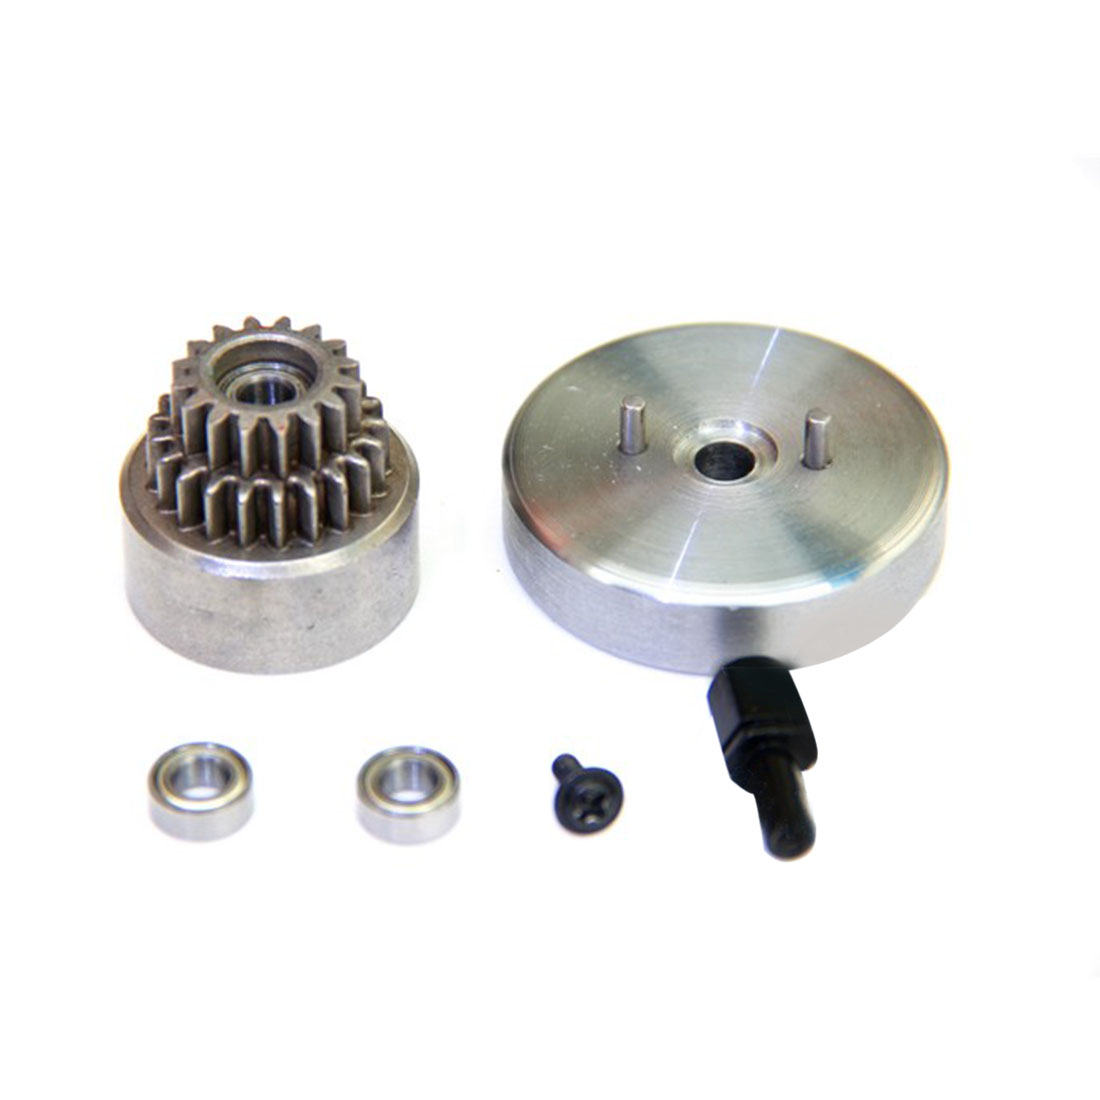 toyan-moteur-double-engrenages-embrayage-modifie-kit-pour-toyan-fs-s100-fs-s100g-fs-s100-w-fs-s100g-w